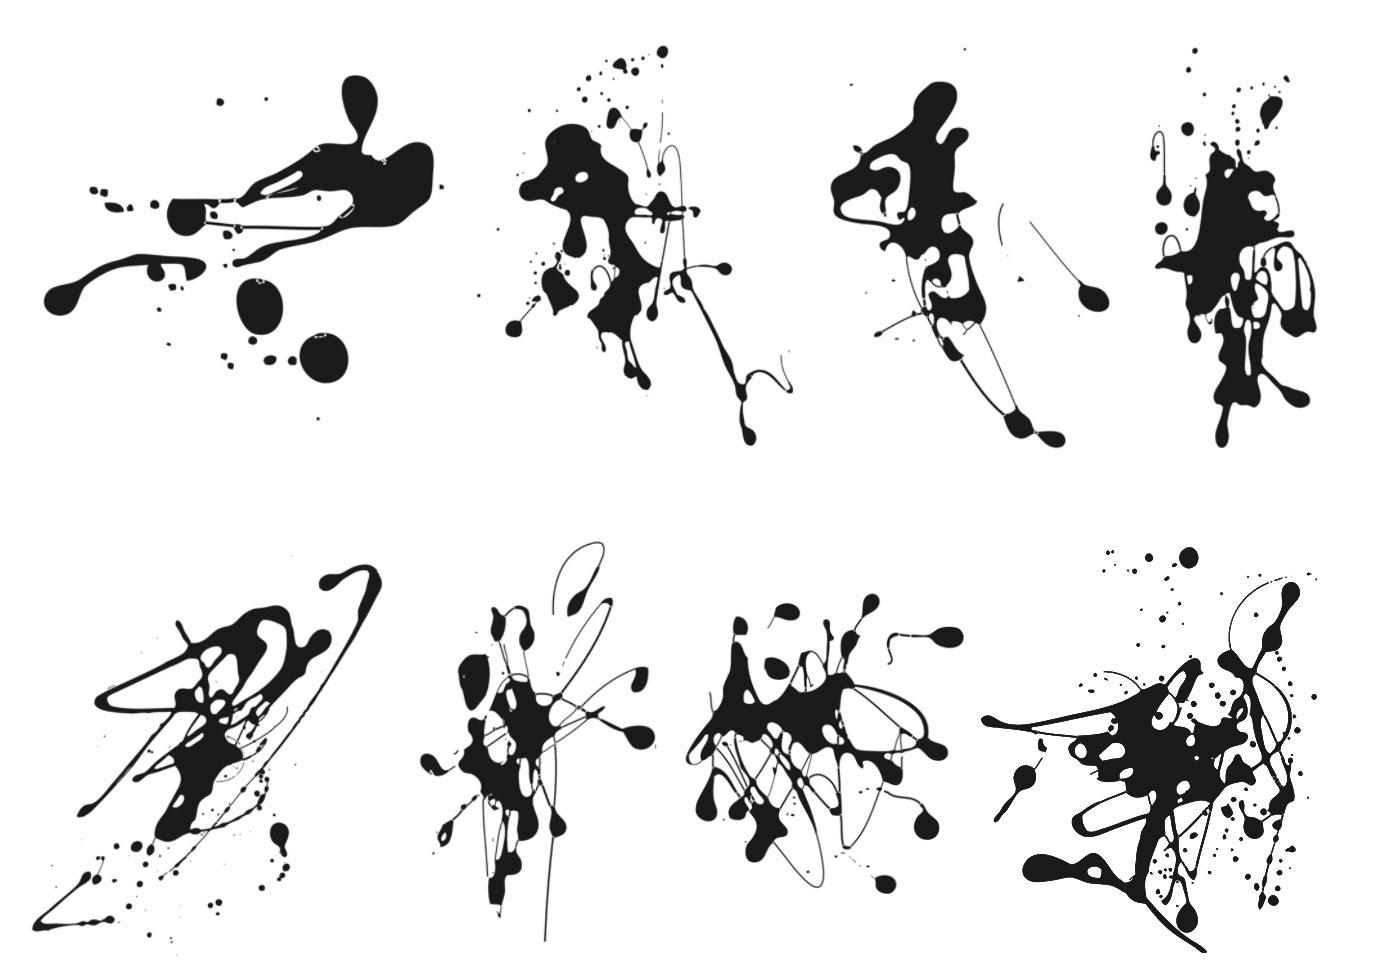 splatter free vector art 6076 free downloads rh vecteezy com ink splatter vector eps free download color ink splatter vector